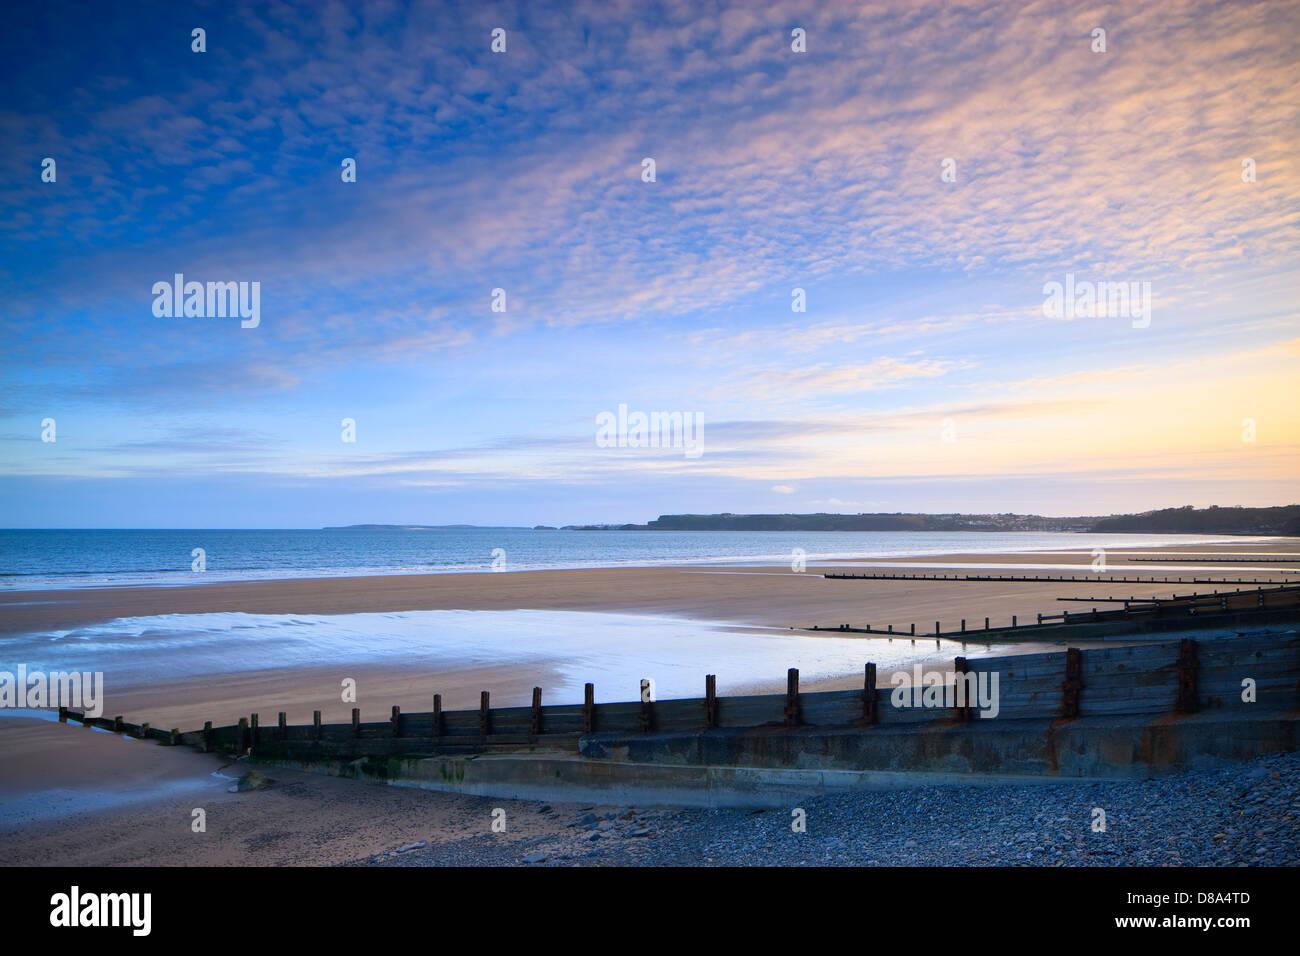 Spiaggia amroth nr saundersfoot pembrokeshire nel Galles al tramonto Immagini Stock